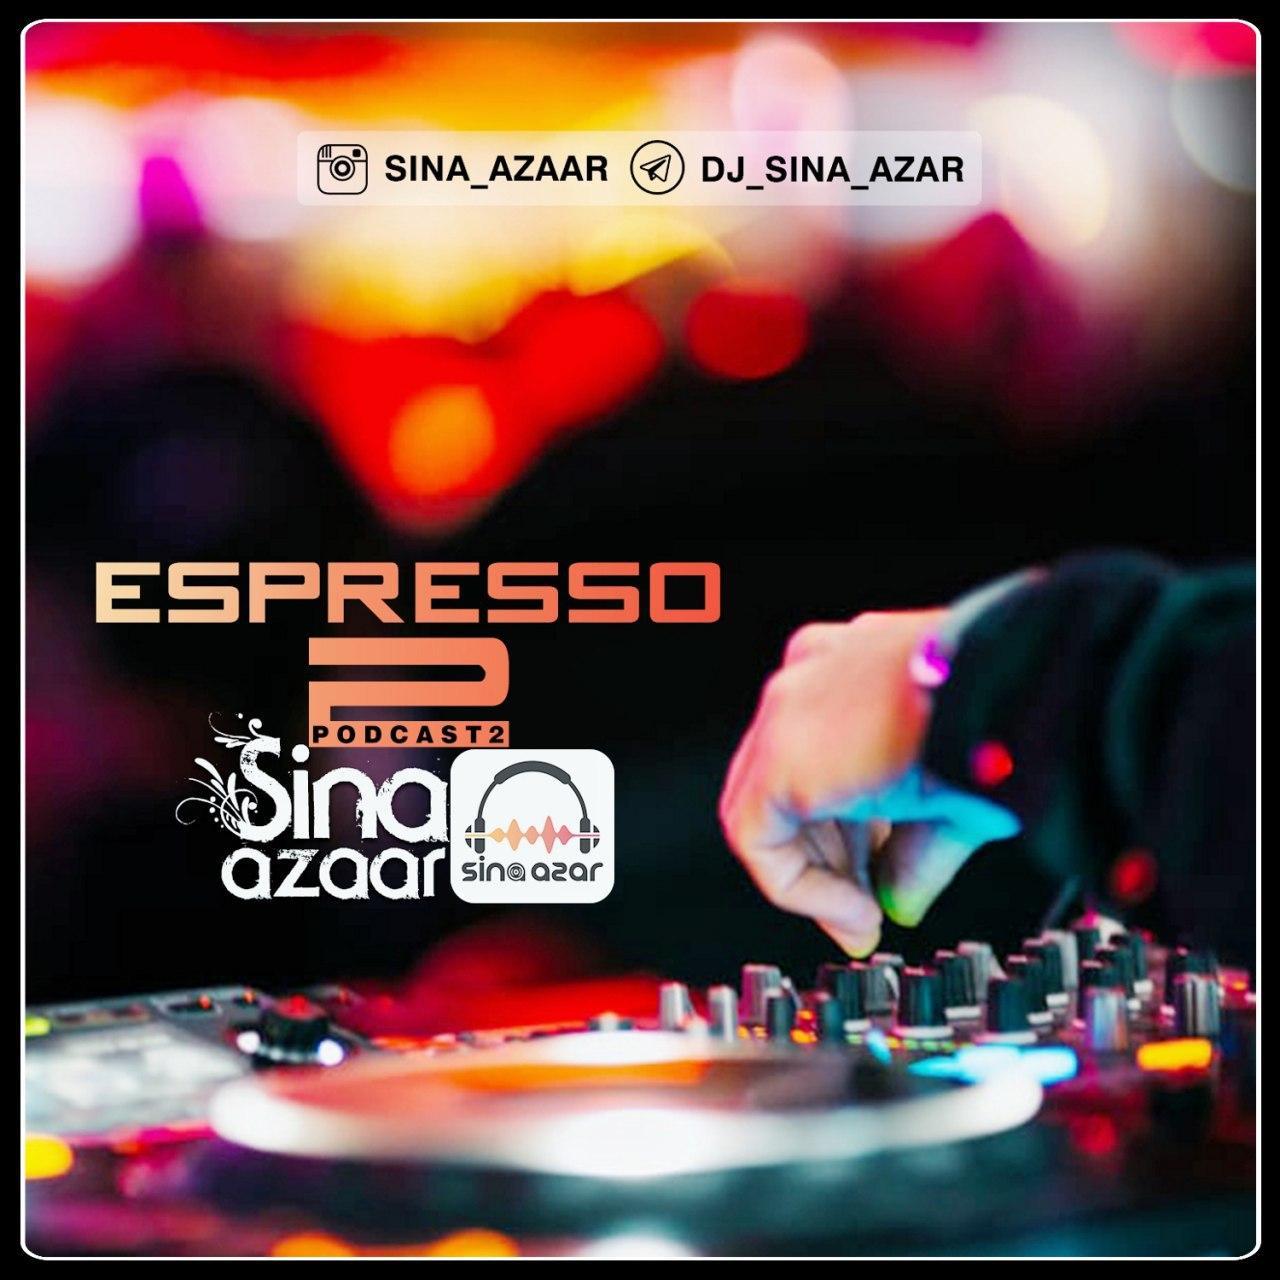 Dj Sina Azar – Espresso (Podcast 02)